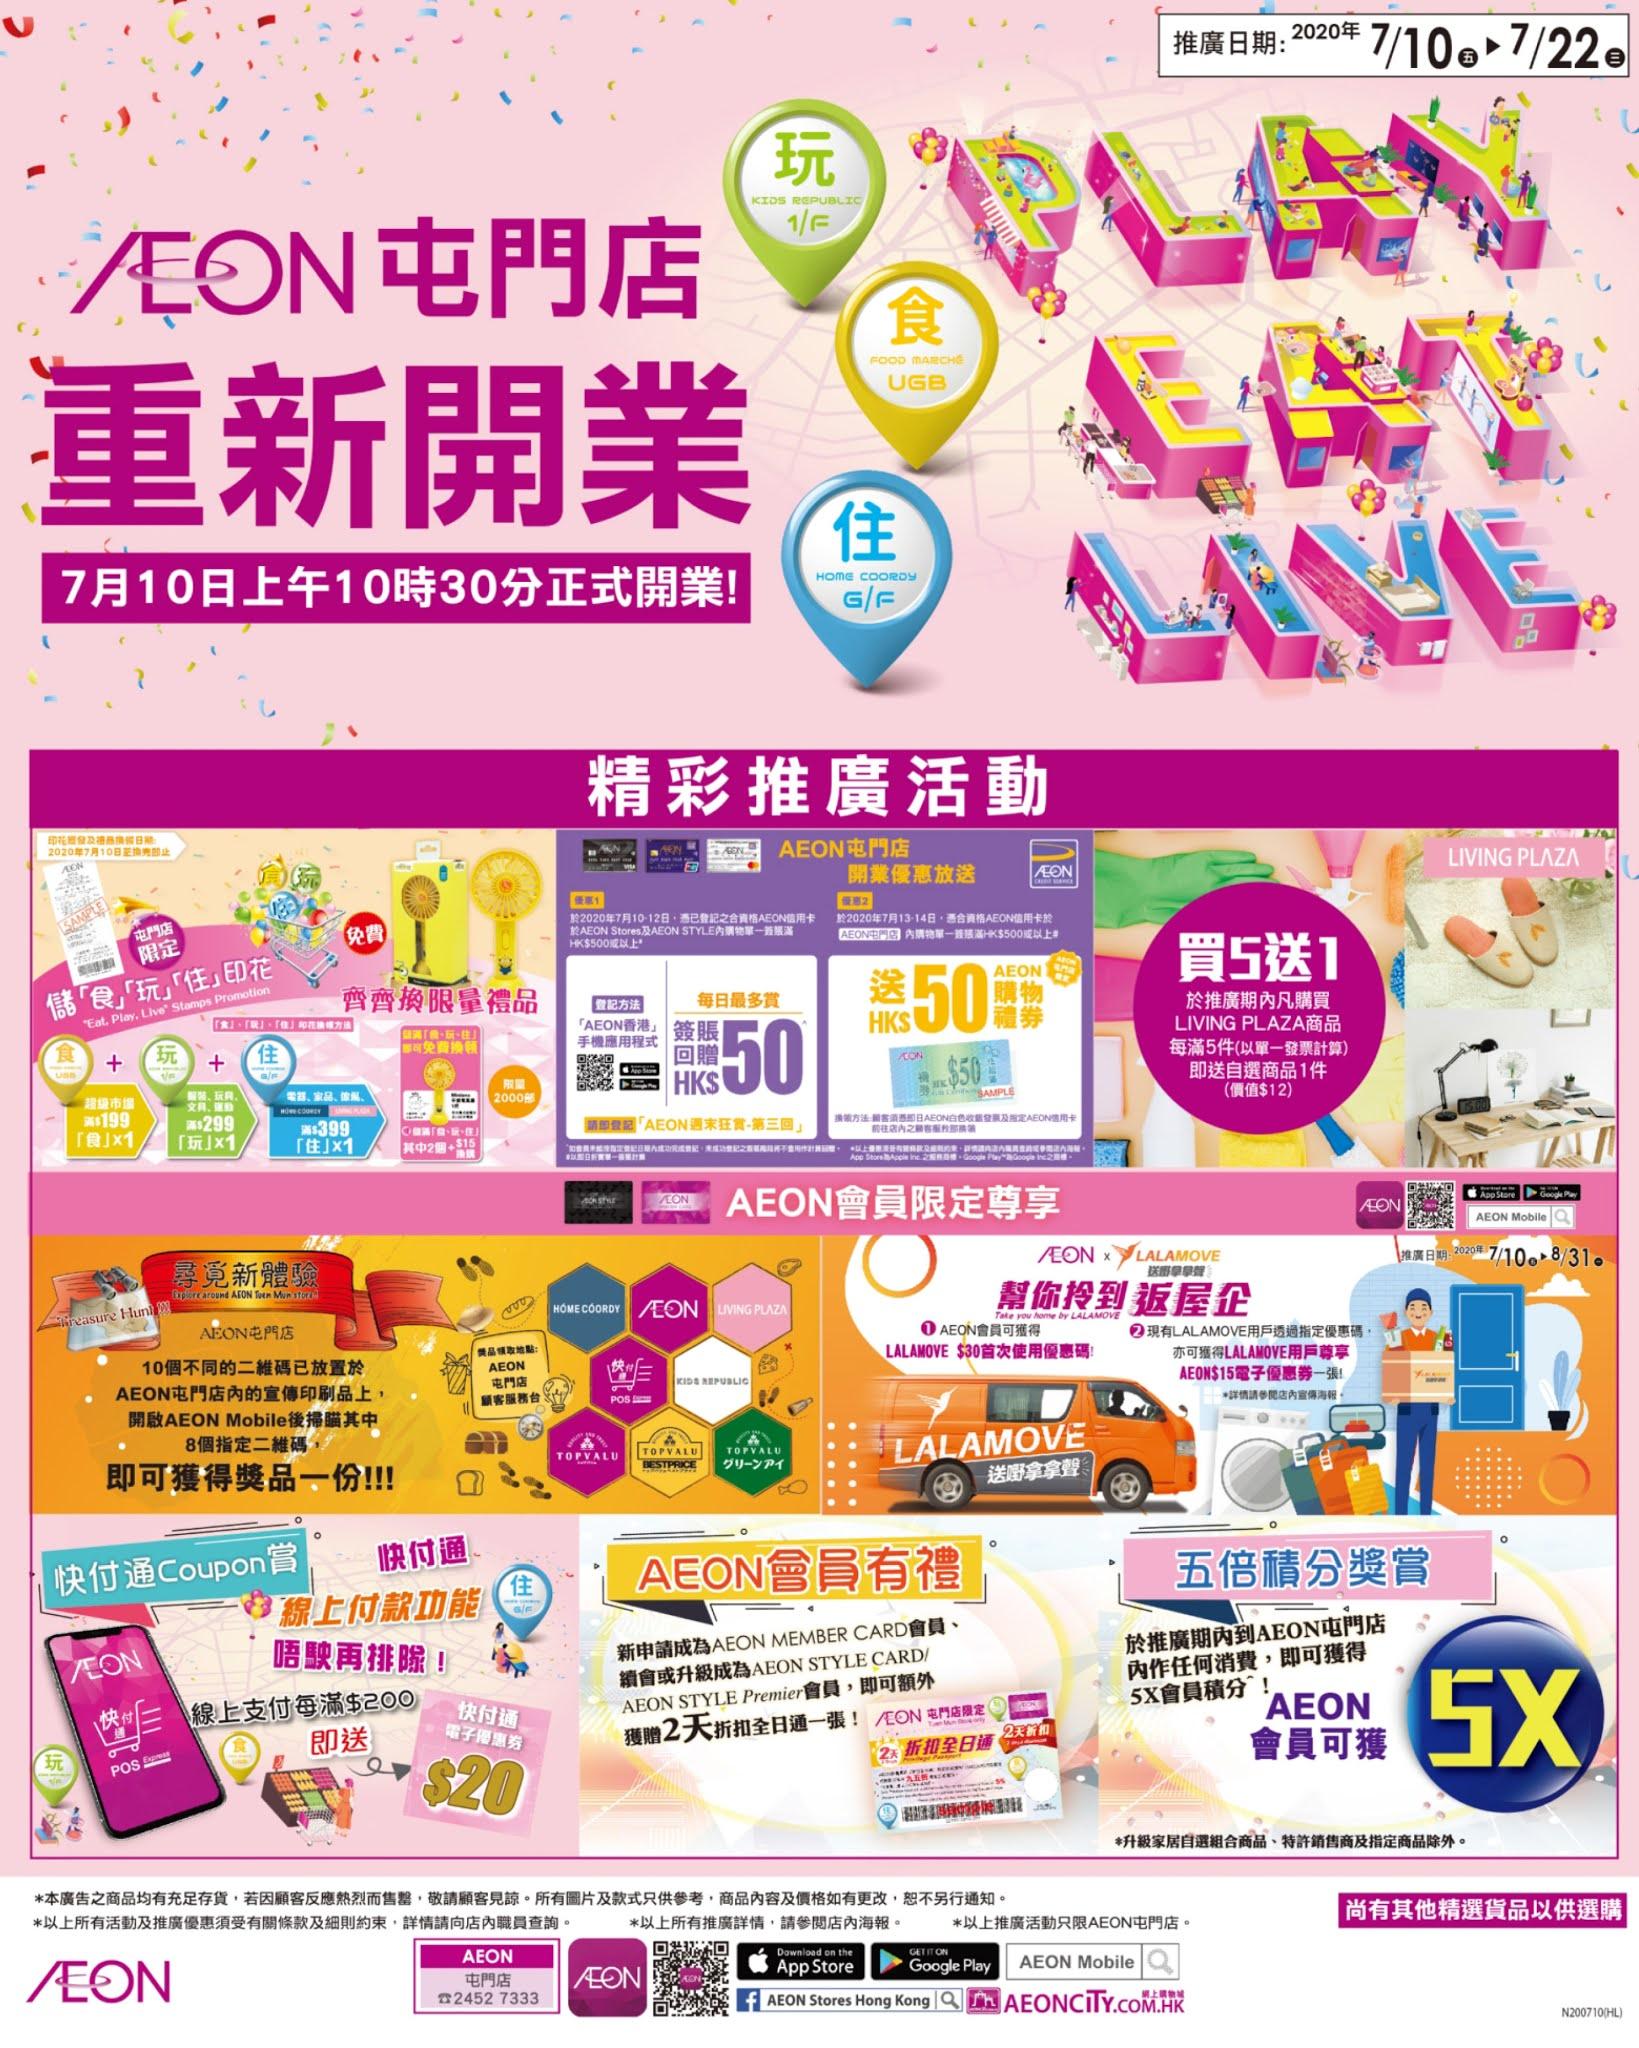 Aeon: 屯門店開業優惠 至7月22日